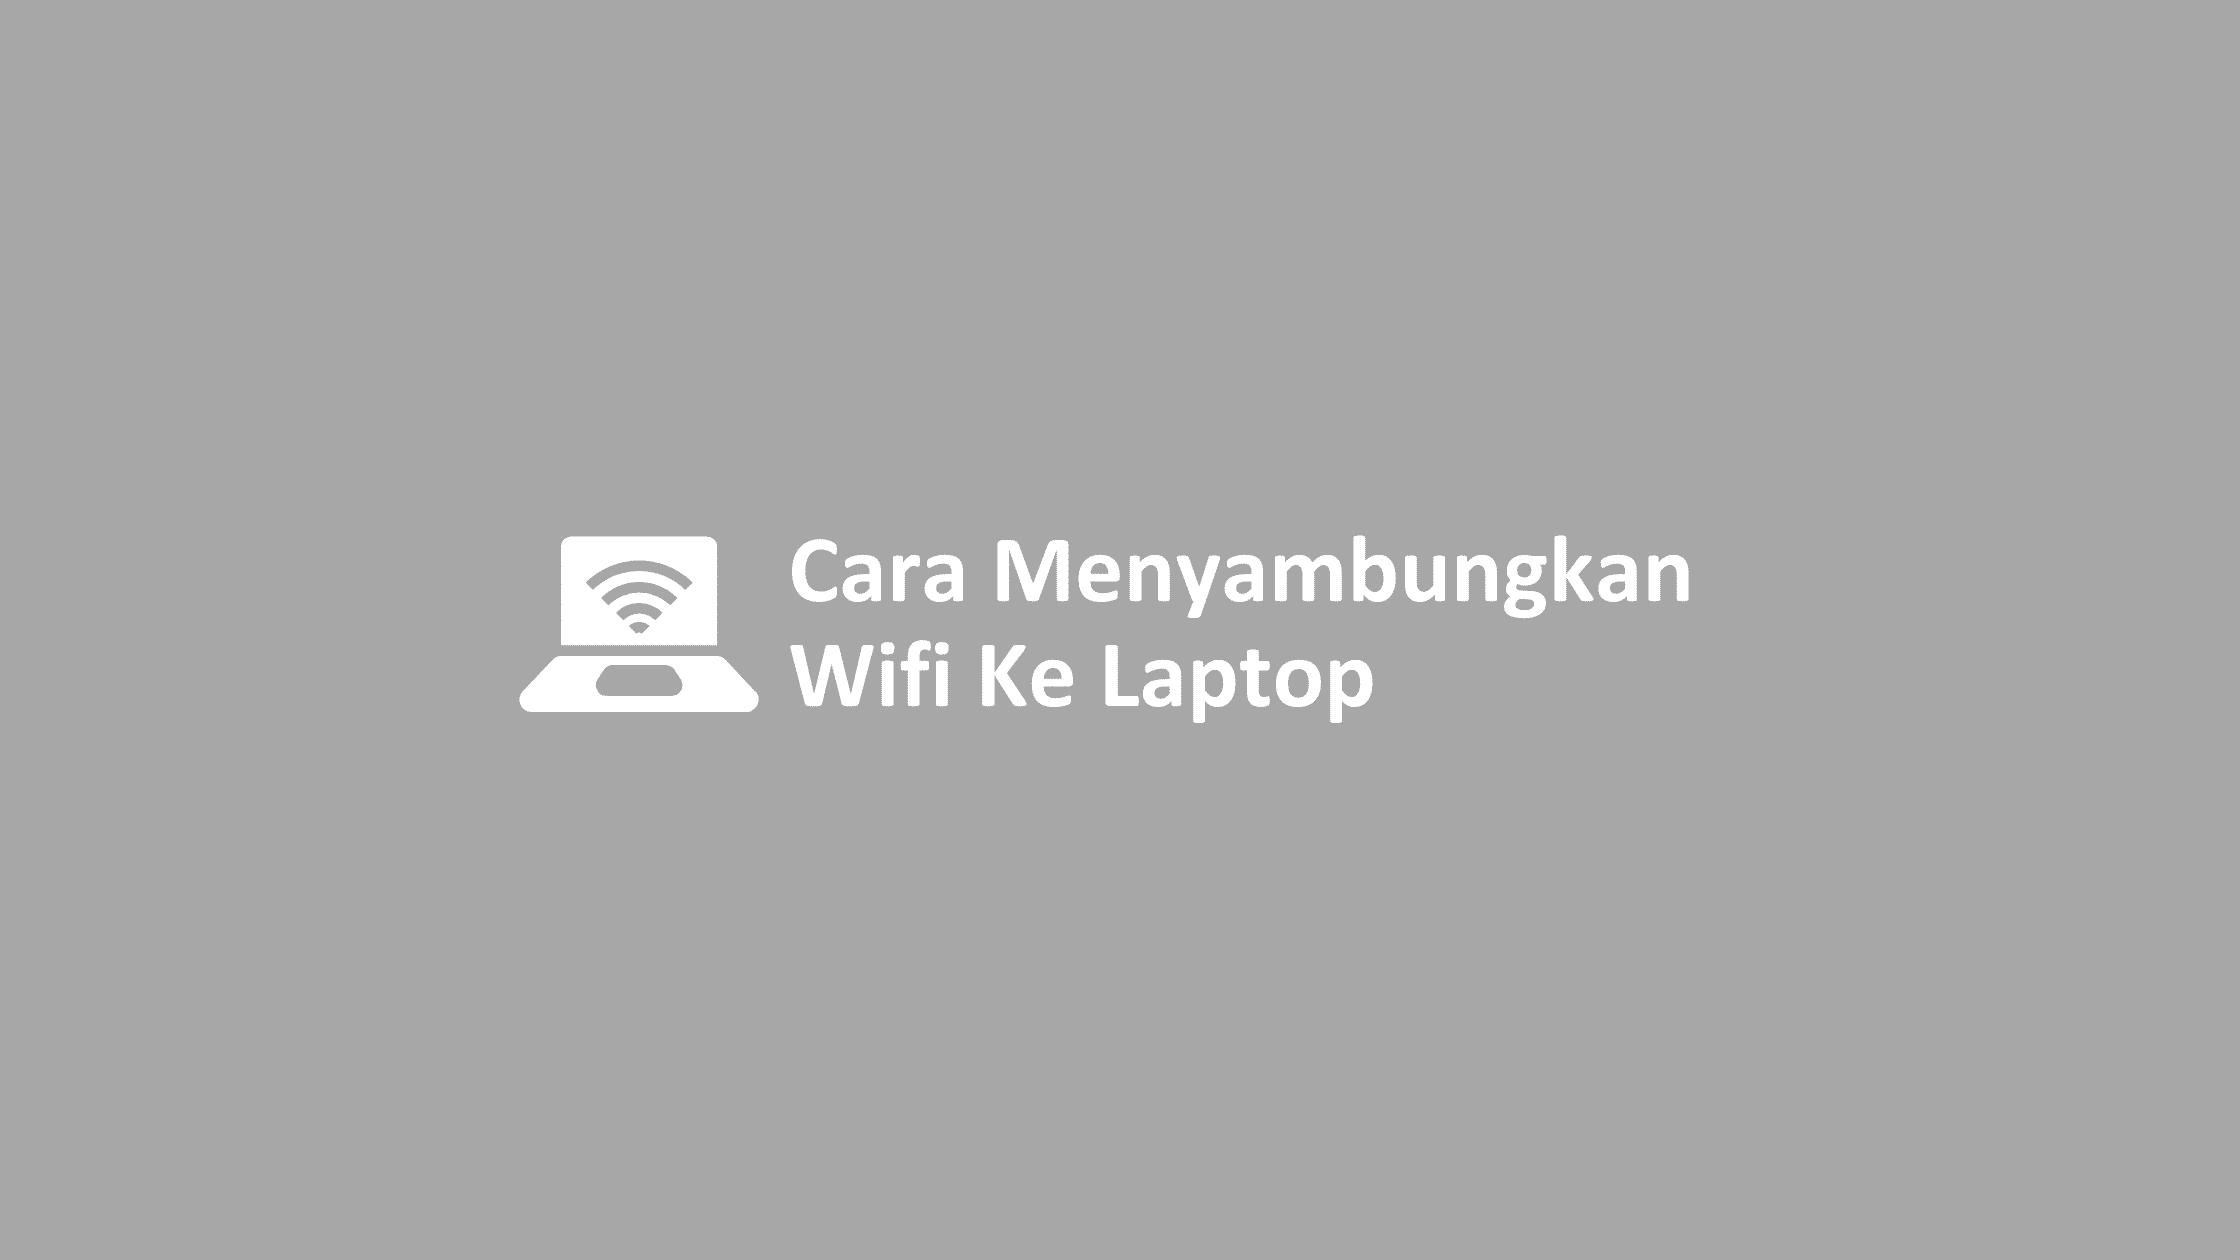 cara menyambungkan wifi ke laptop